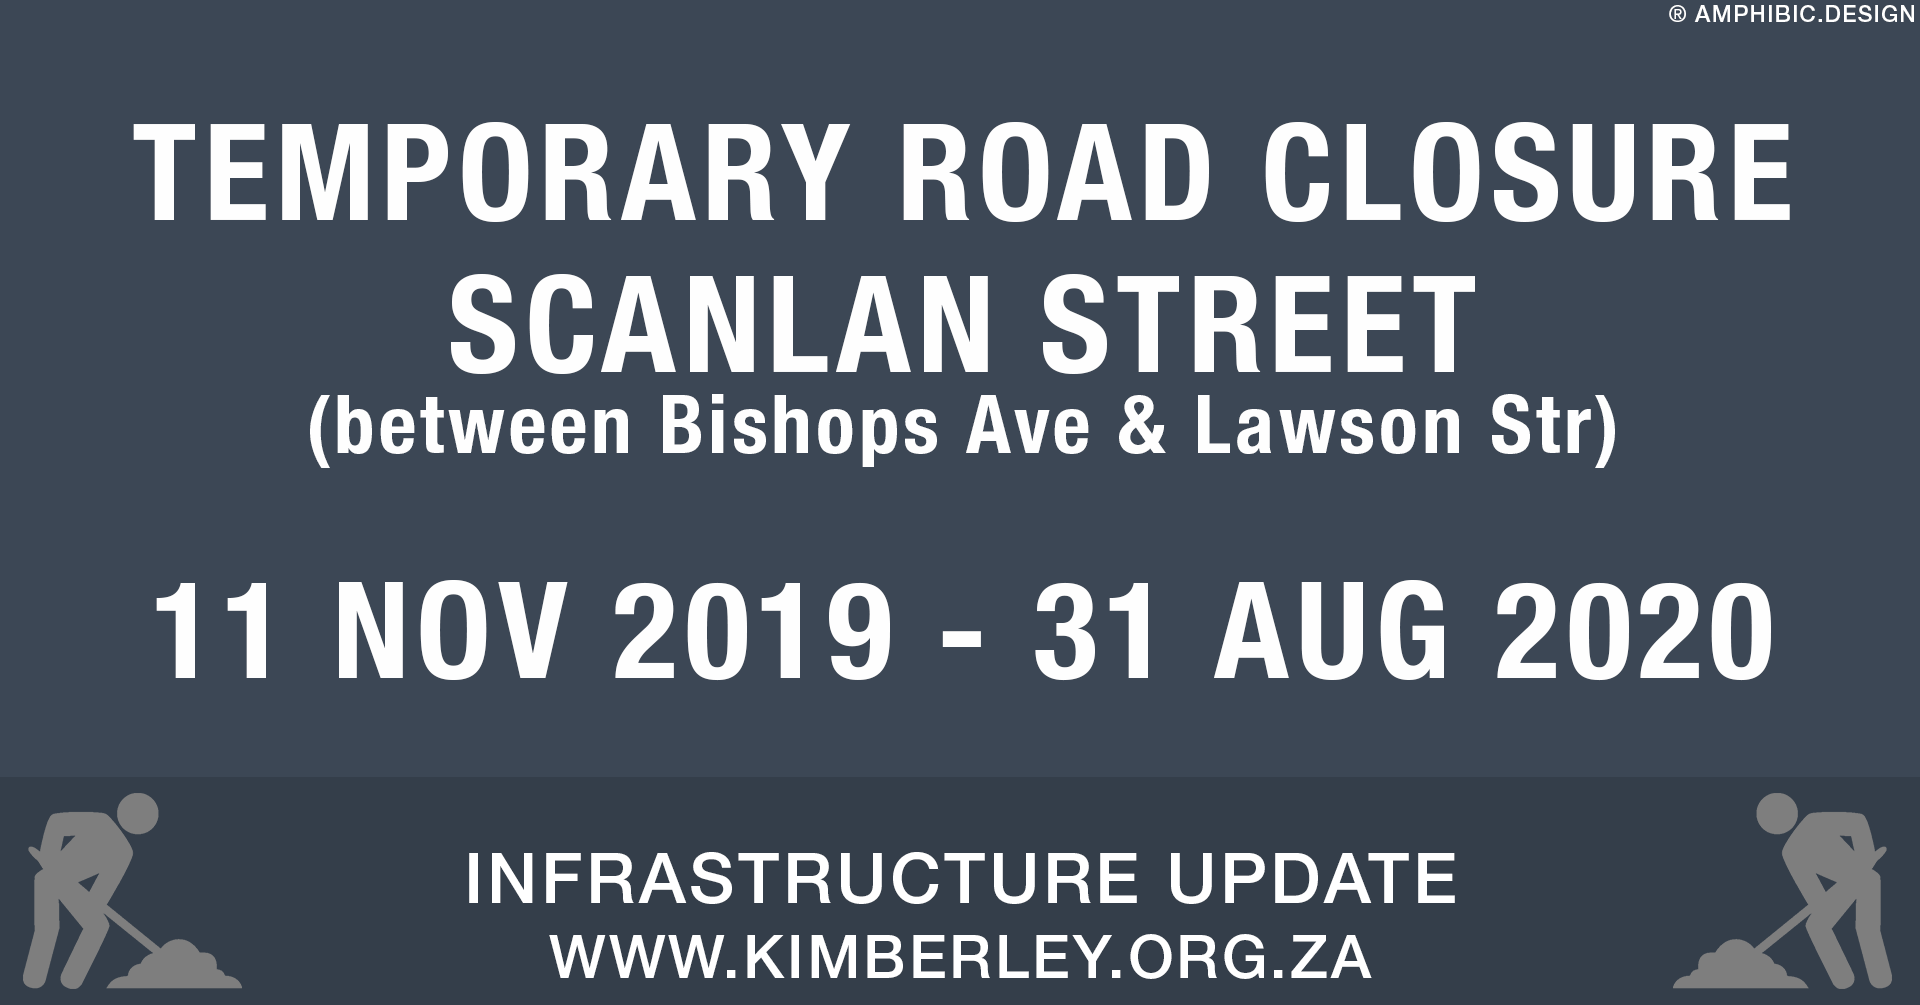 TEMP_ROAD_CLOSURE-Scanlan_Street-20191111